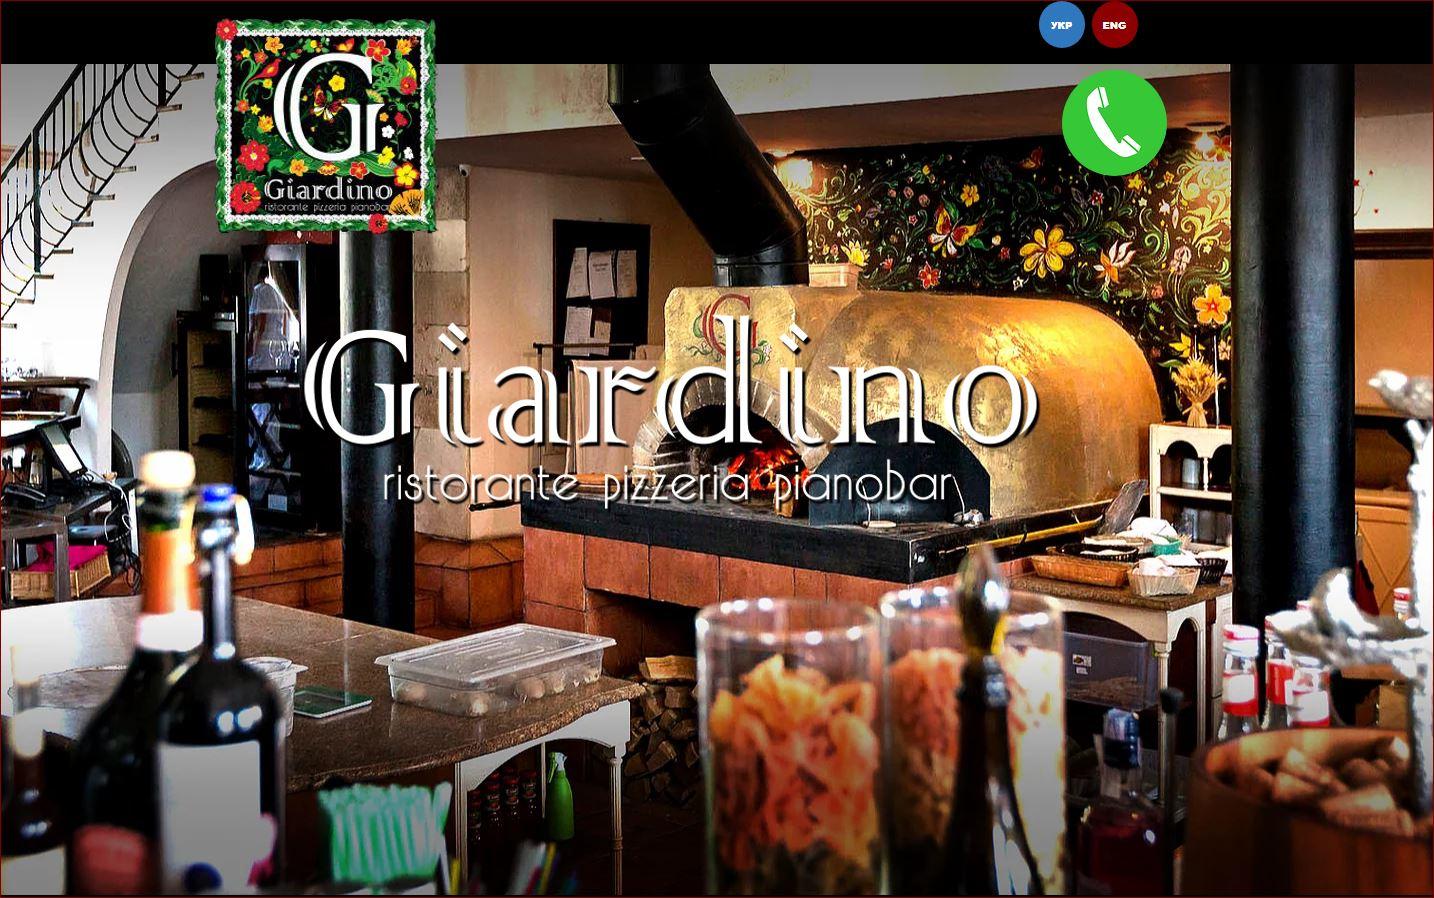 Фото Дизайн сайта www.giardino-restaurant.com